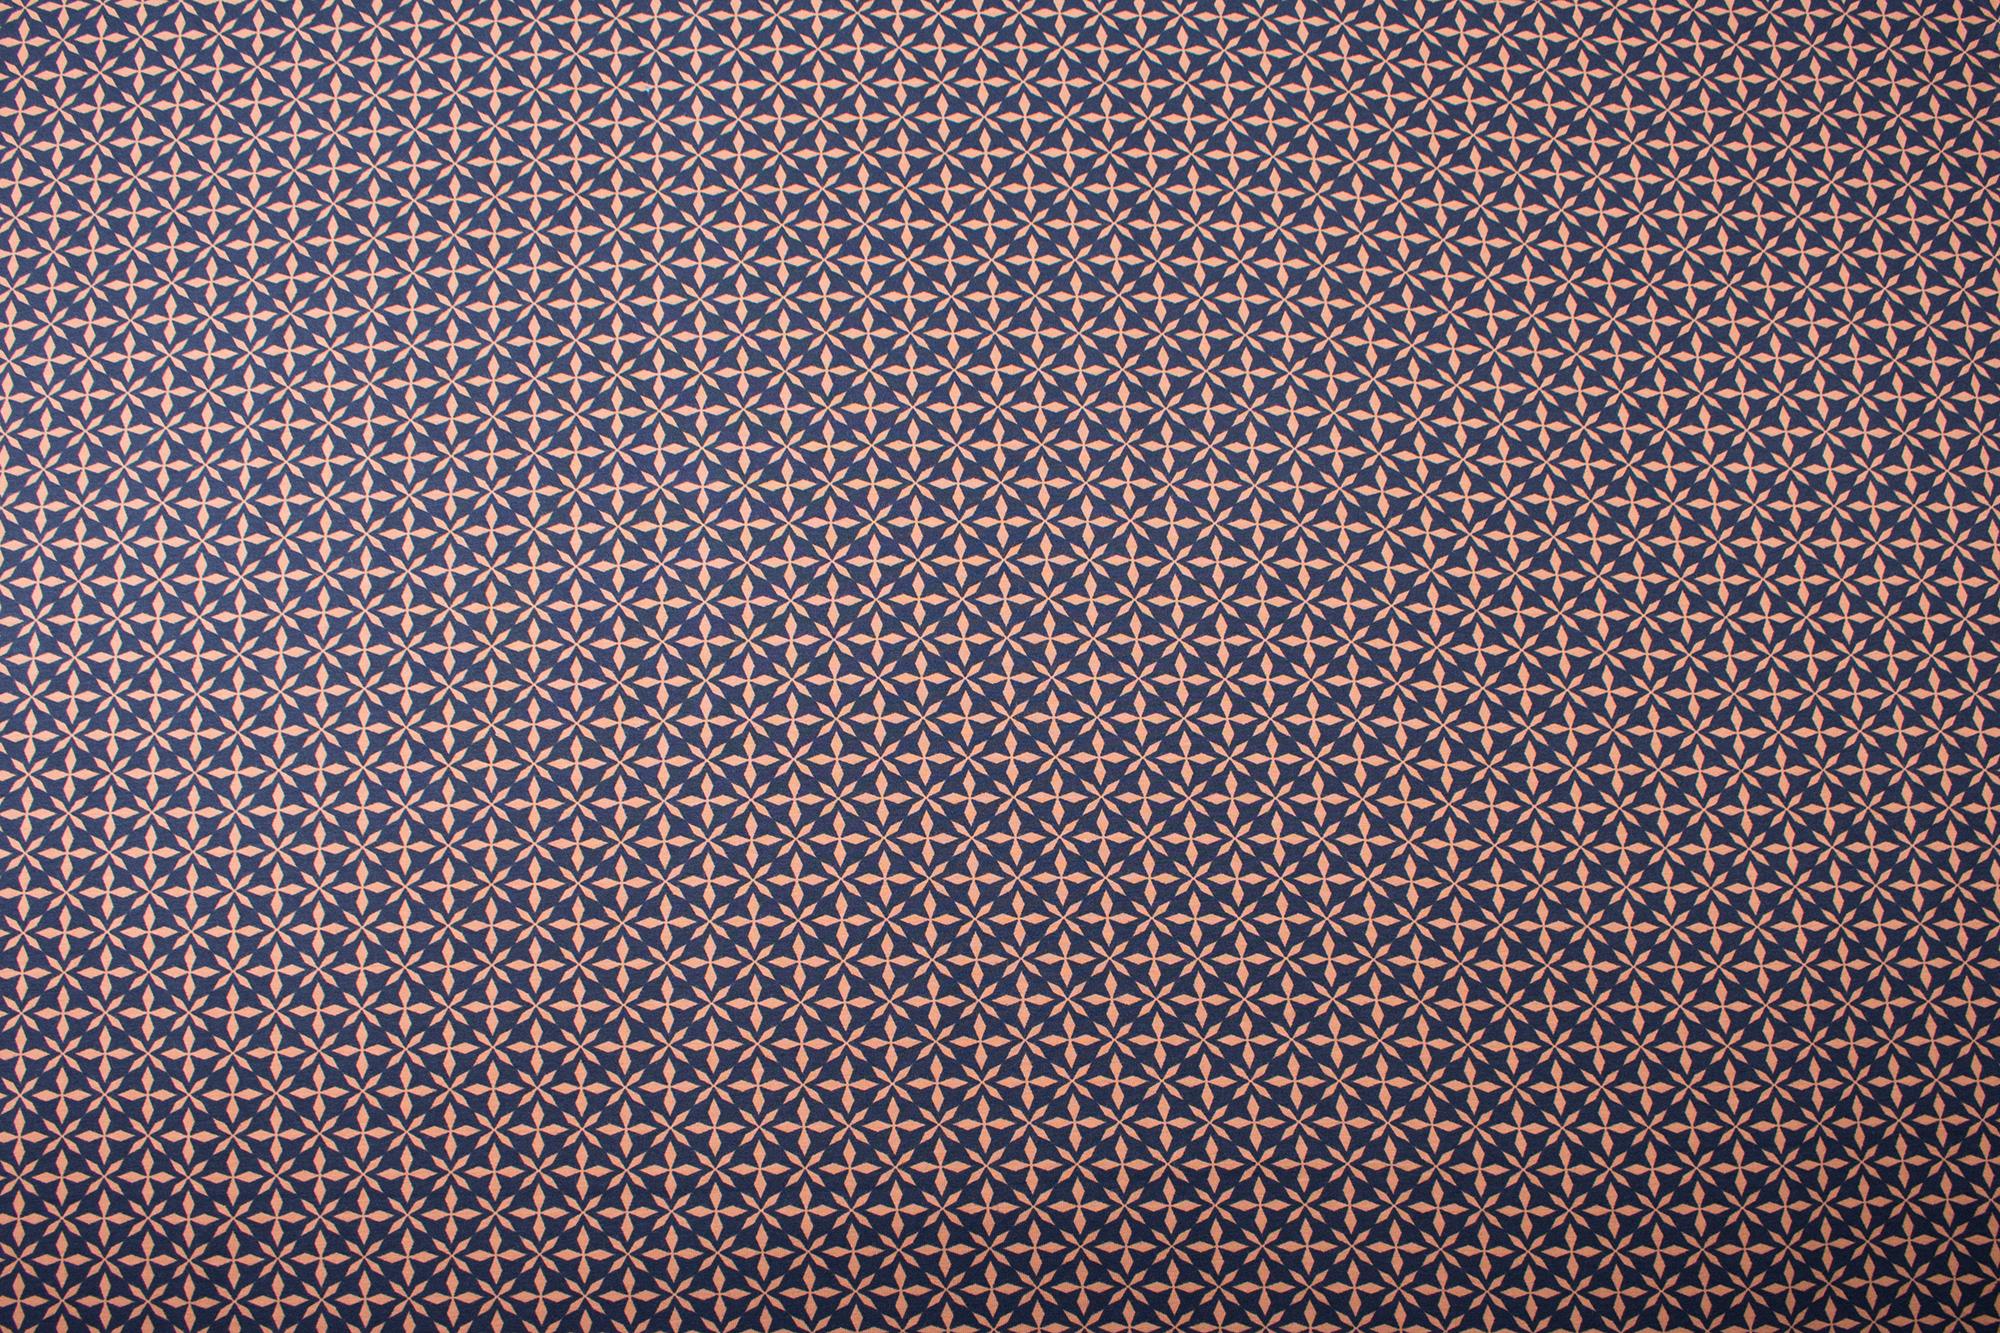 jersey avalana kreuze blau braun skandinavischer stoff jersey stoffe smalino. Black Bedroom Furniture Sets. Home Design Ideas